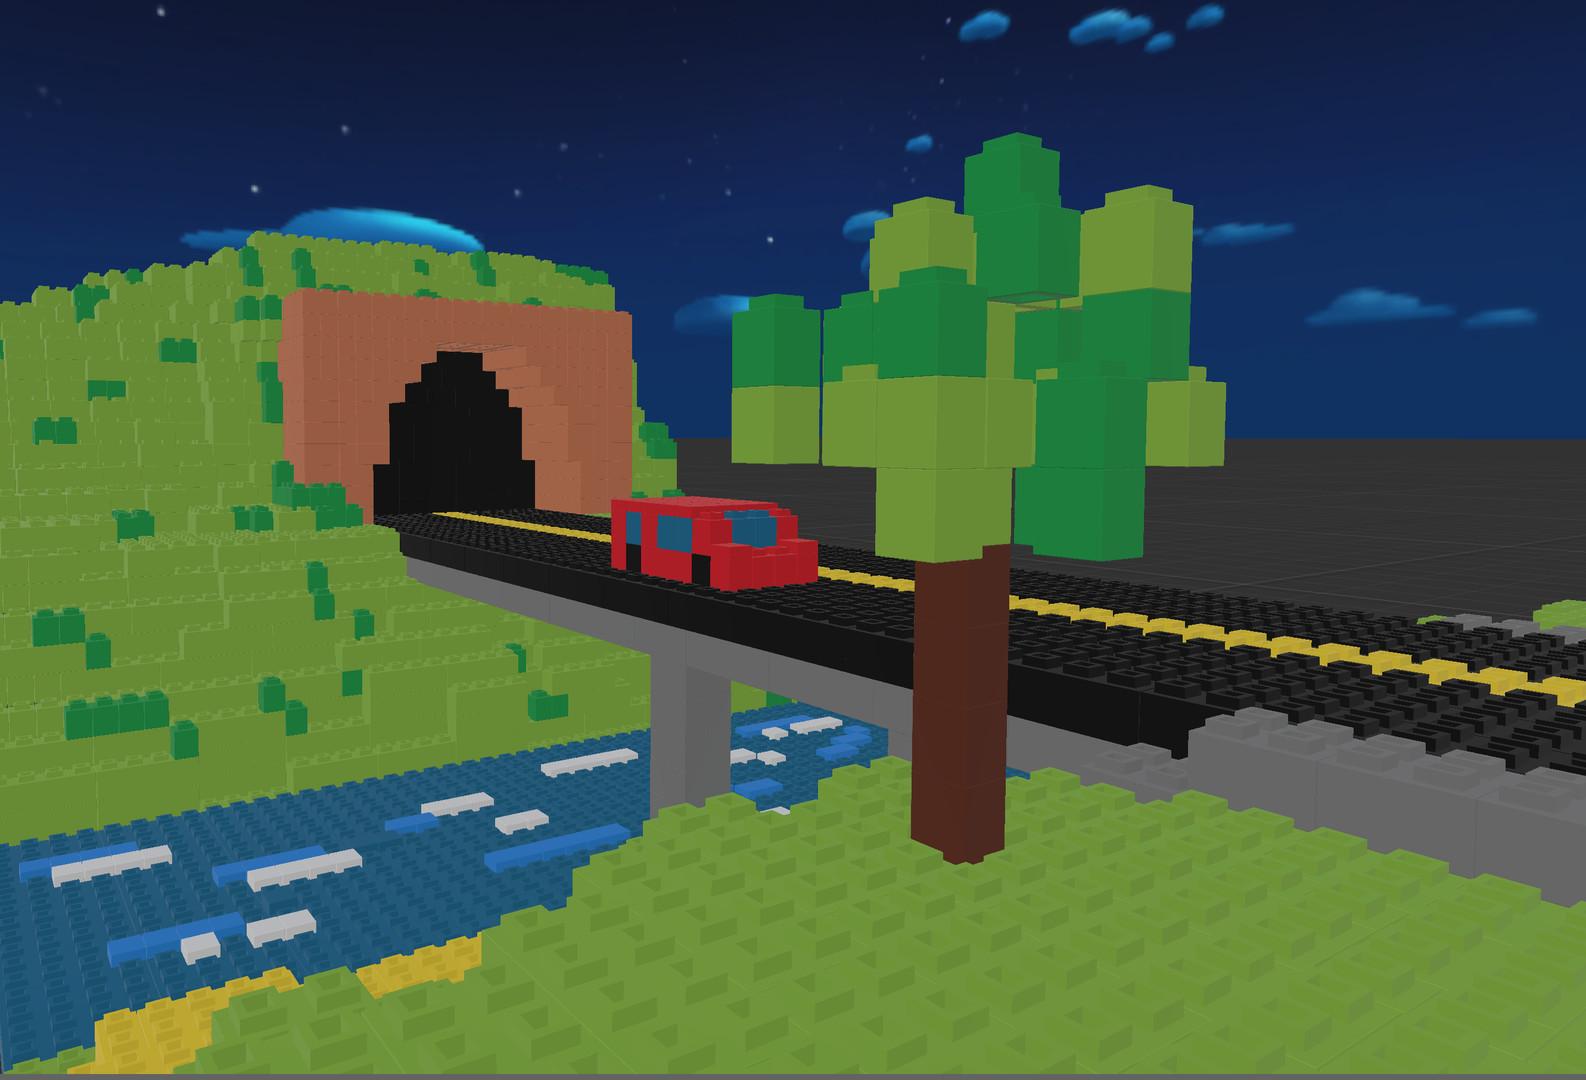 Oculus Quest 游戏《BricksVR》虚拟像素插图(1)